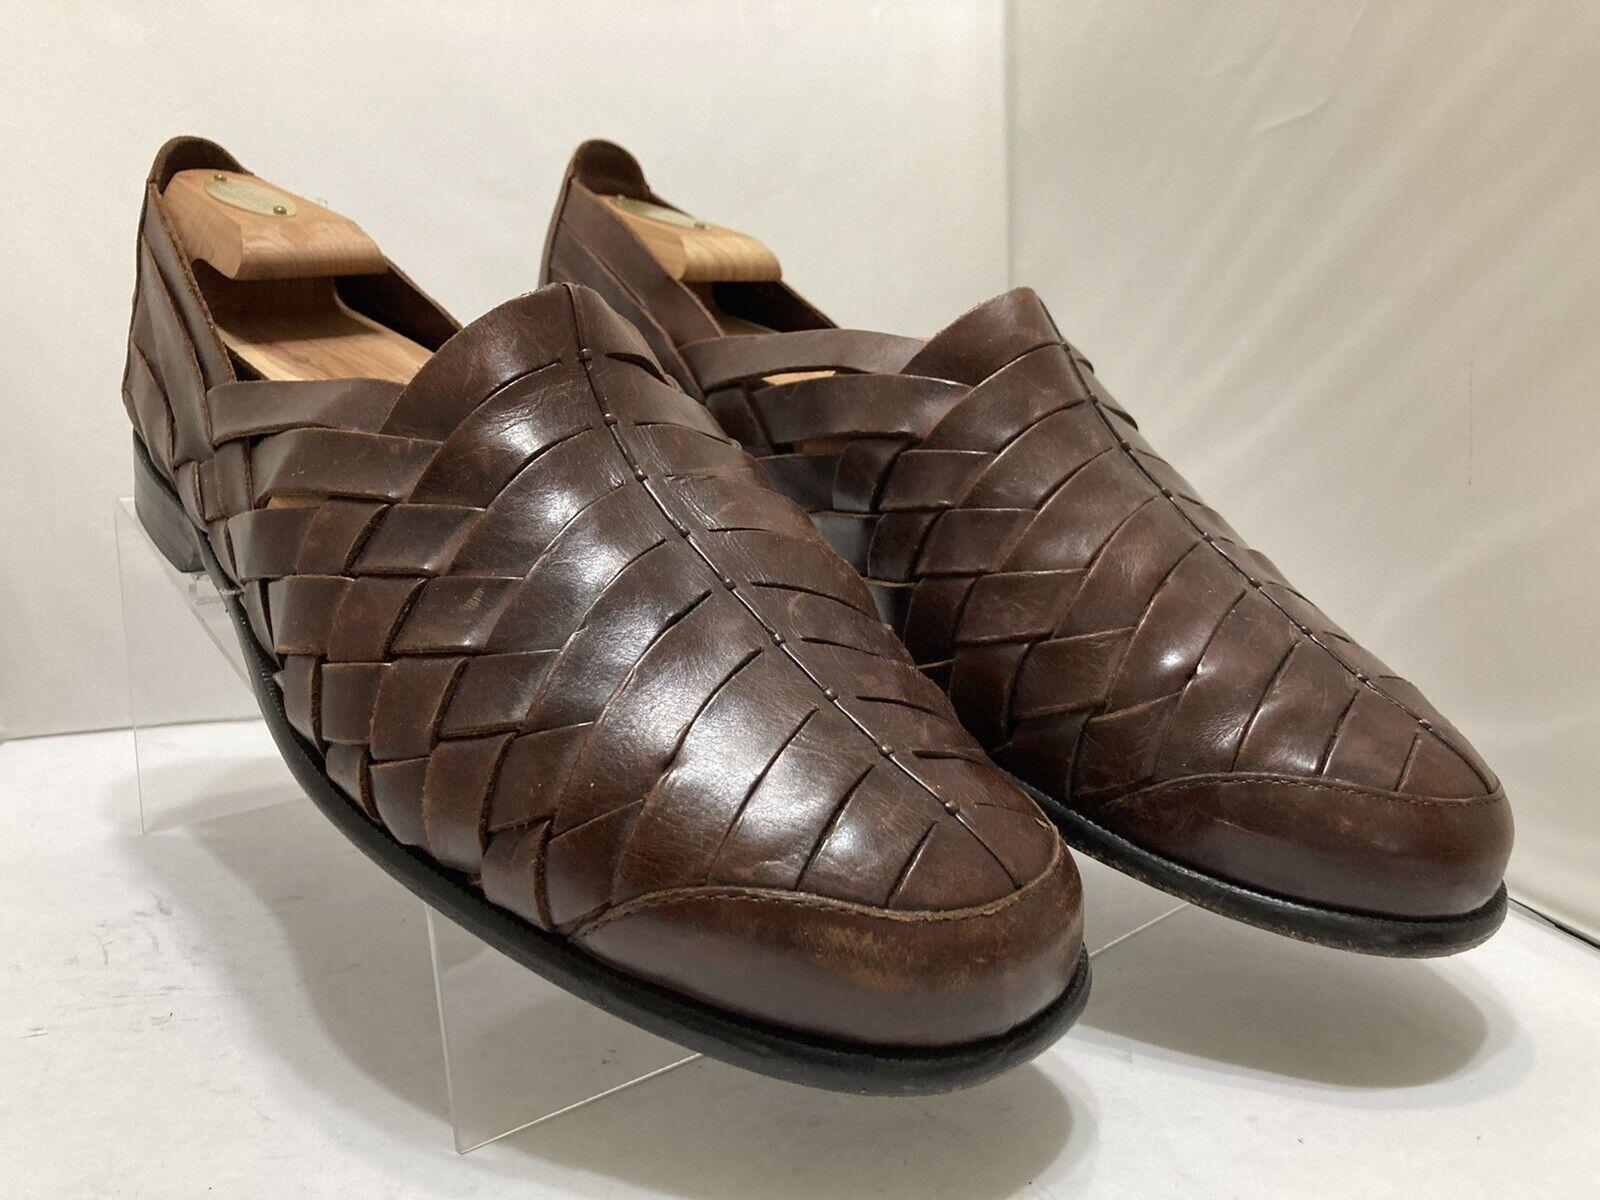 Cole Haan Men's Fisherman Slip On Sandals Size 12D Saddle Brown Leather